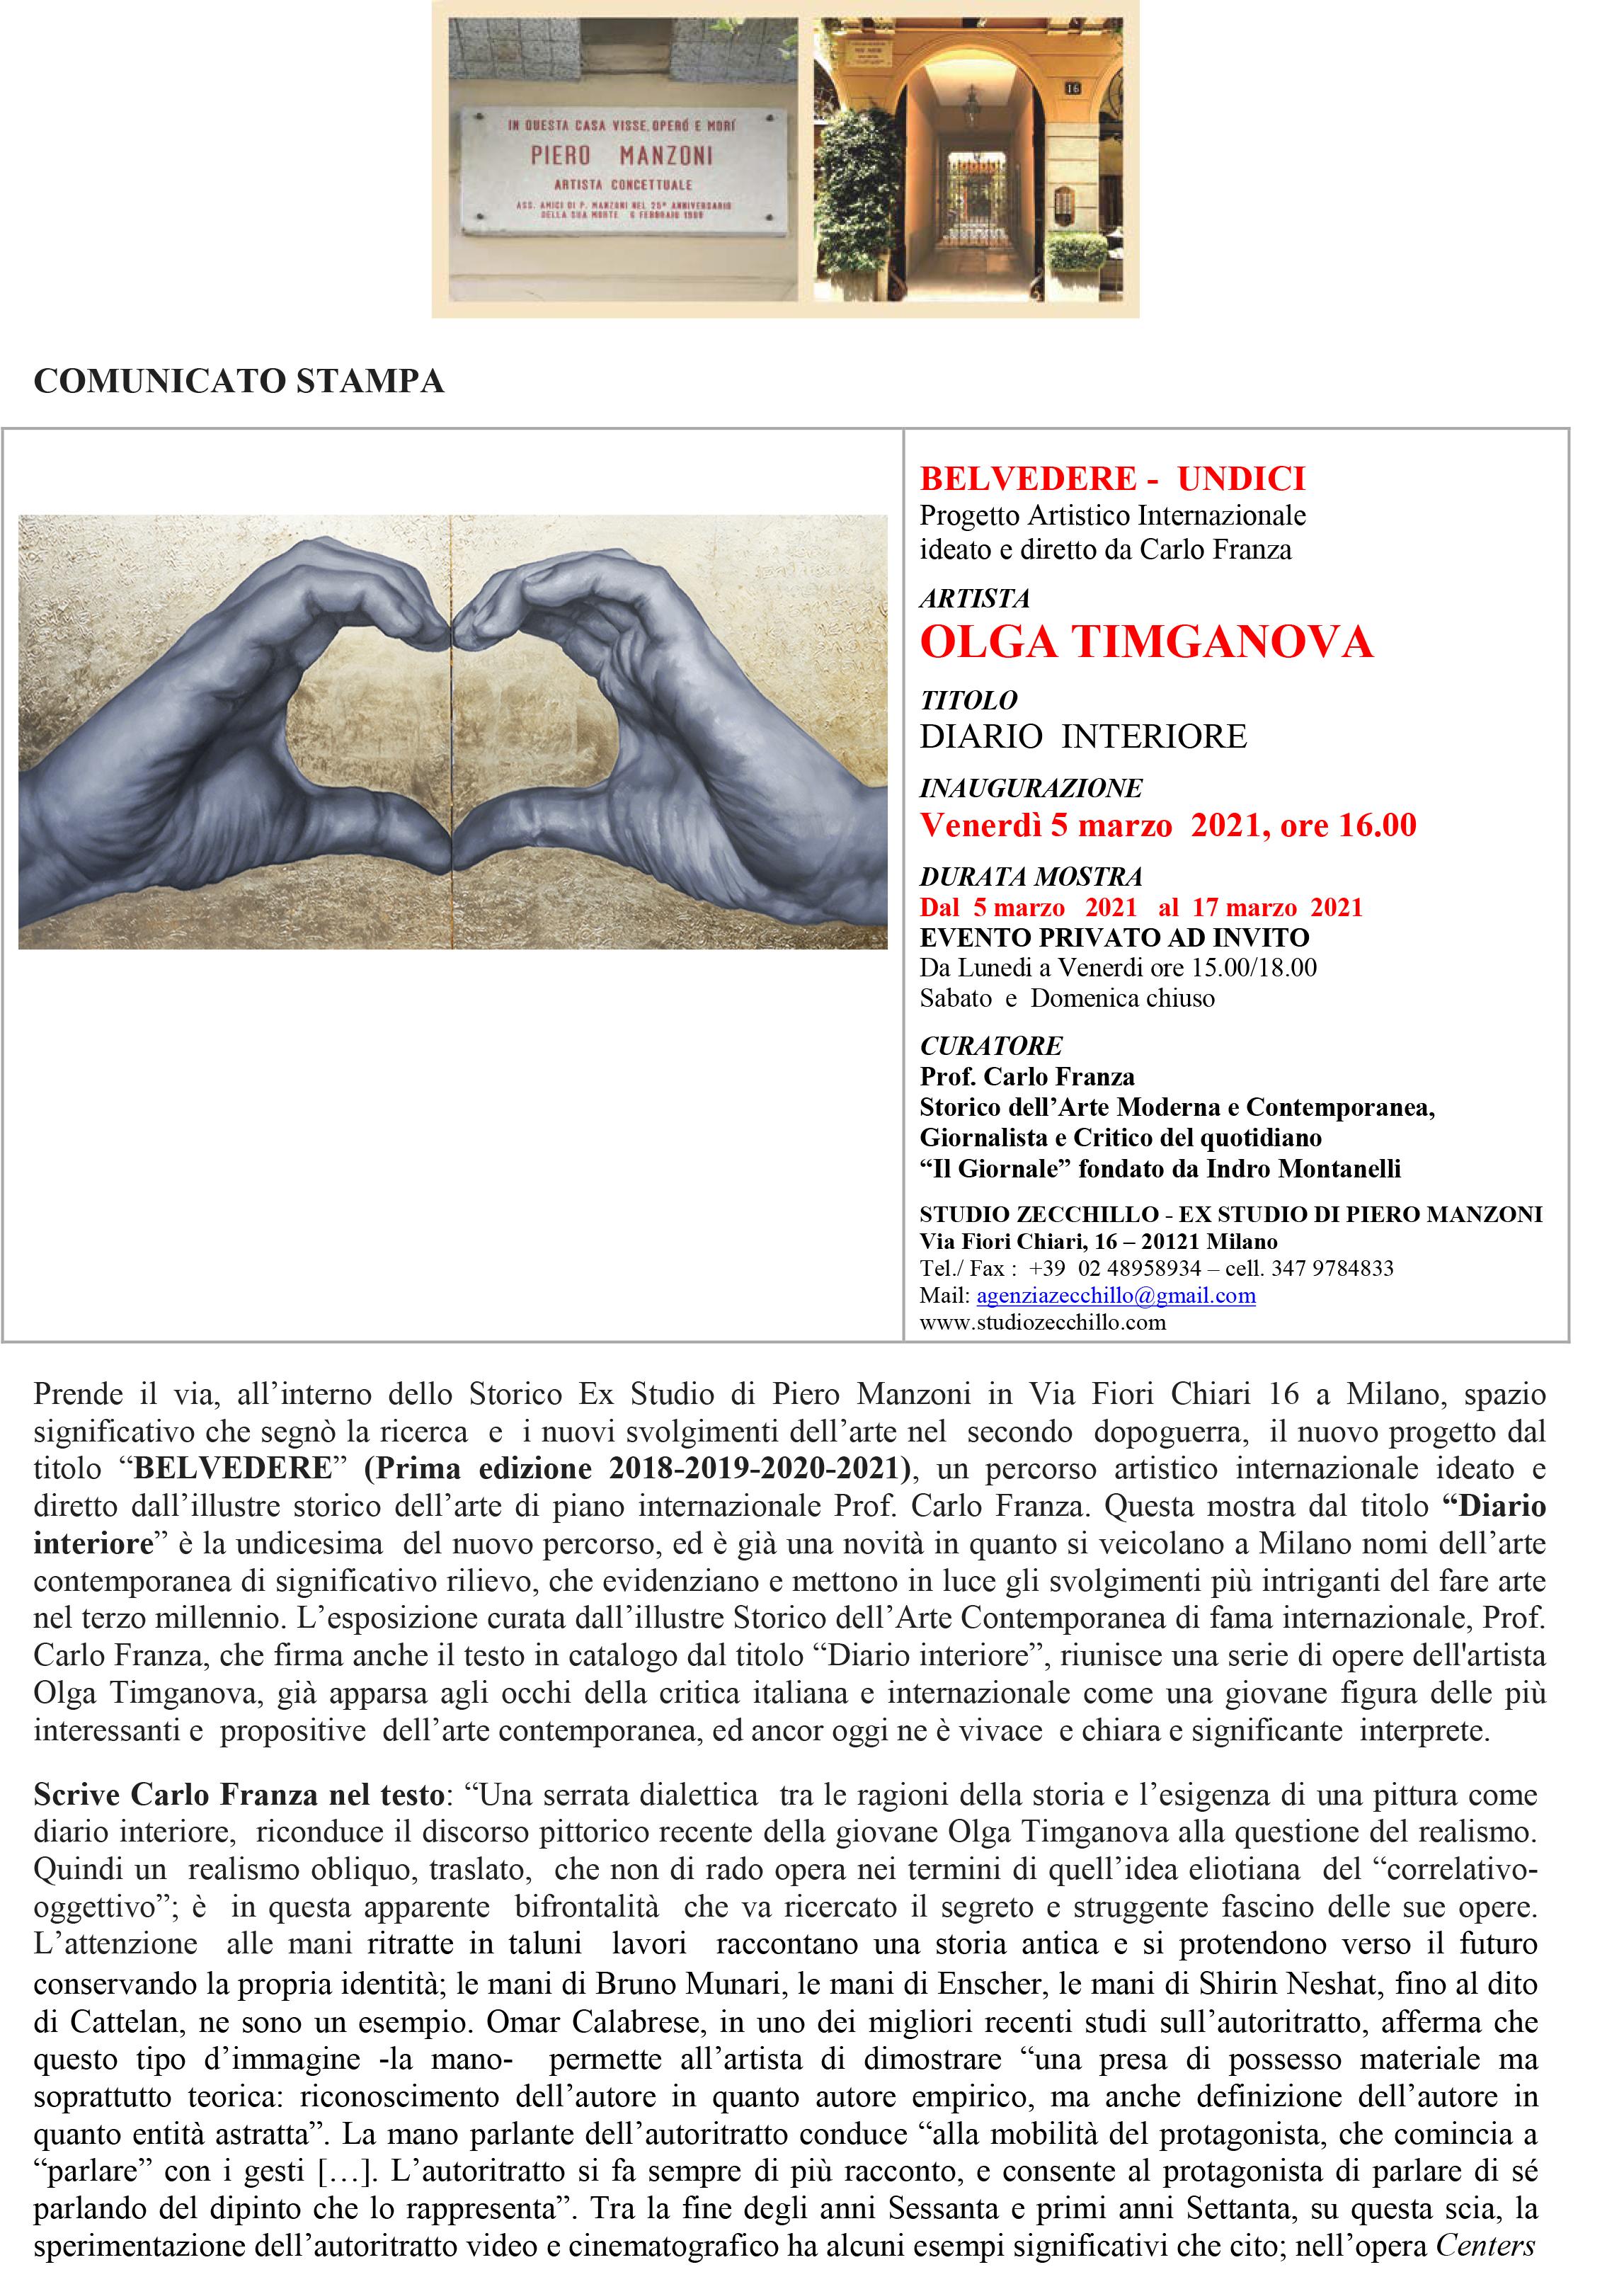 COMUNICATO STAMPA MOSTRA OLGA TIMGANOVA Ex Studio Piero Manzoni 2021-1